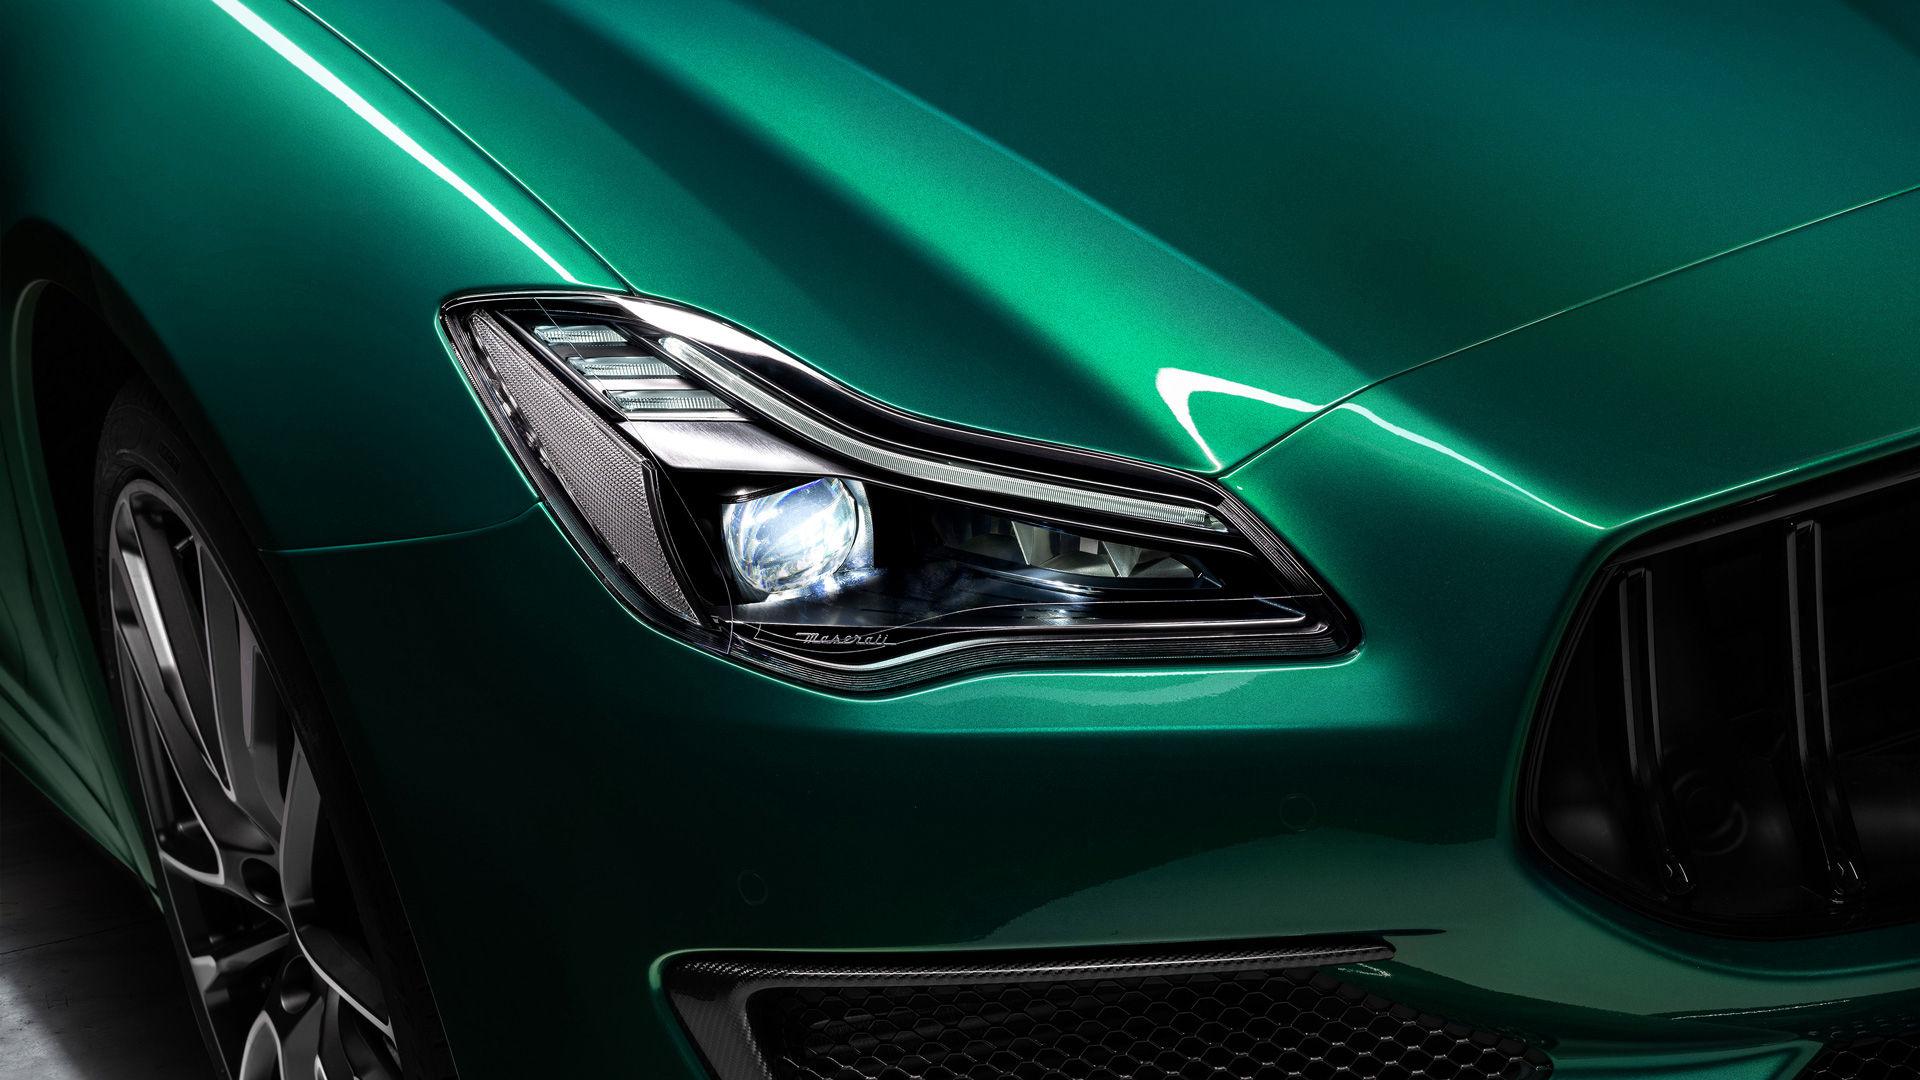 Maserati Quattroporte Trofeo - Grün - Adaptive Voll LED Scheinwerfer